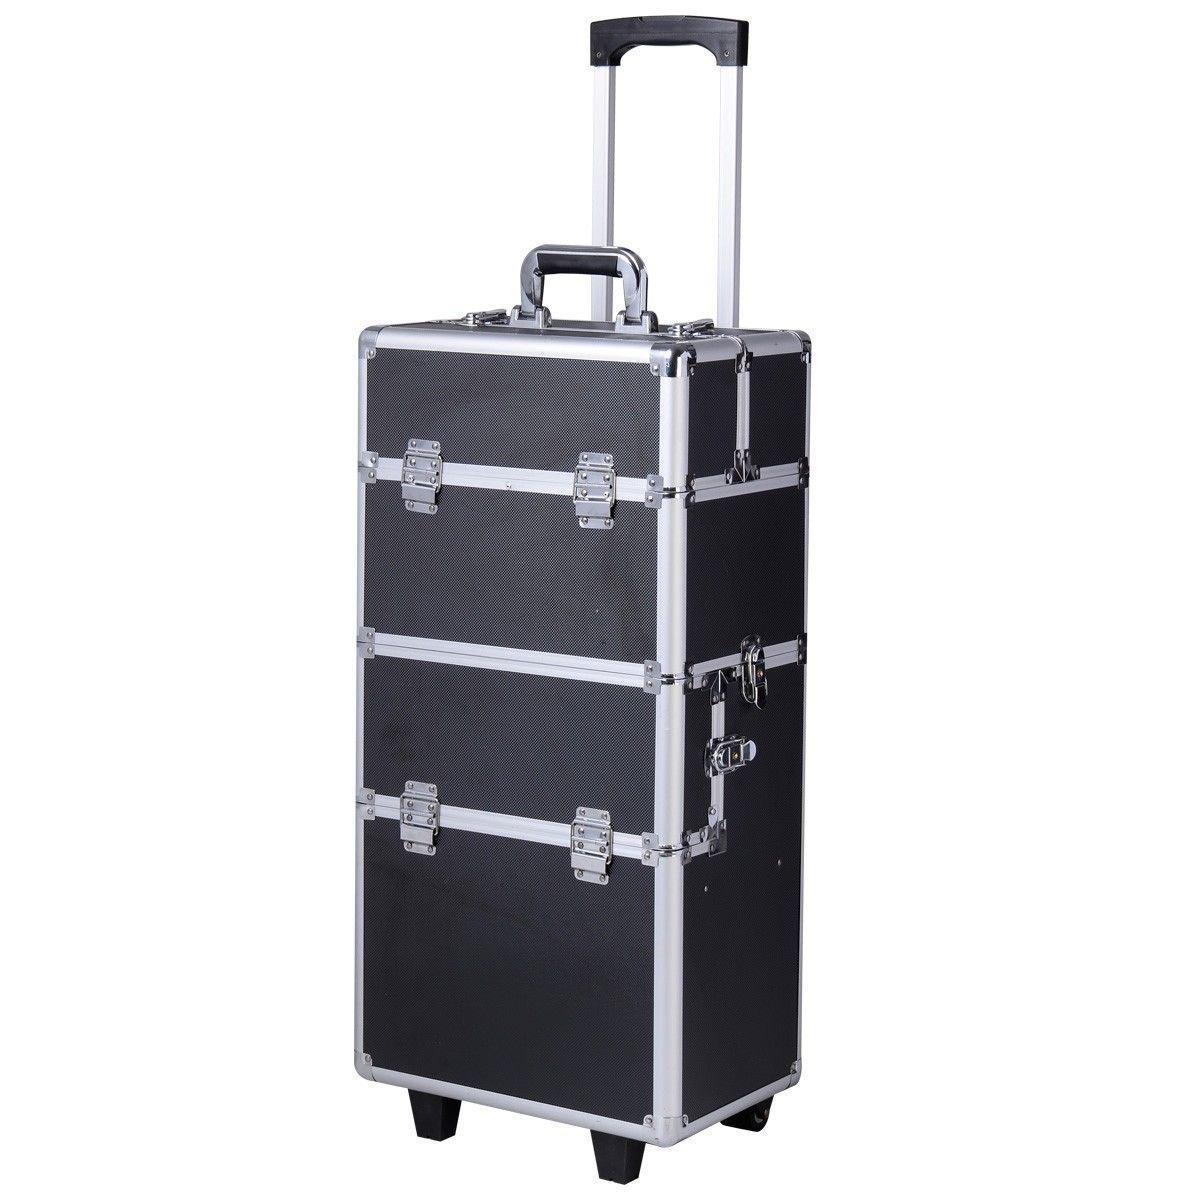 3 in 1 Pro Aluminum Rolling Makeup Case Salon Cosmetic Organizer Trolley - Black Diamond + FREE E-Book